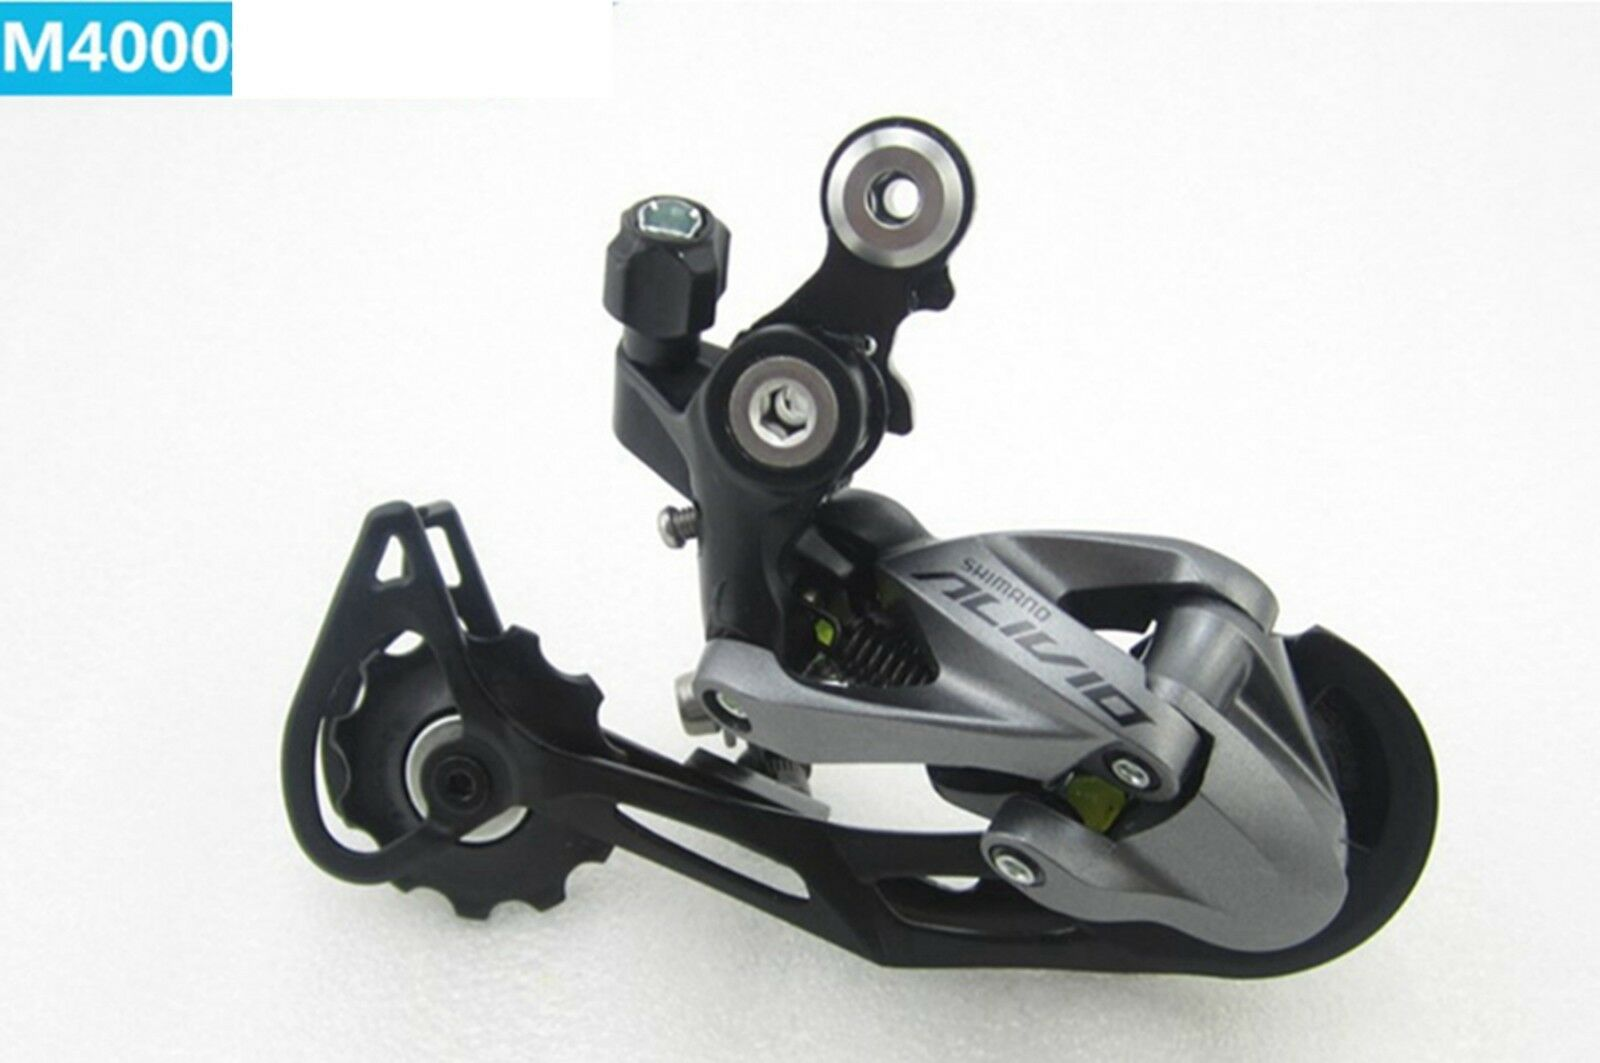 Shimano Alivio Rd M4000 9 Speed Mountain Bike Rear Derailleur Ebay Shadow 9speed